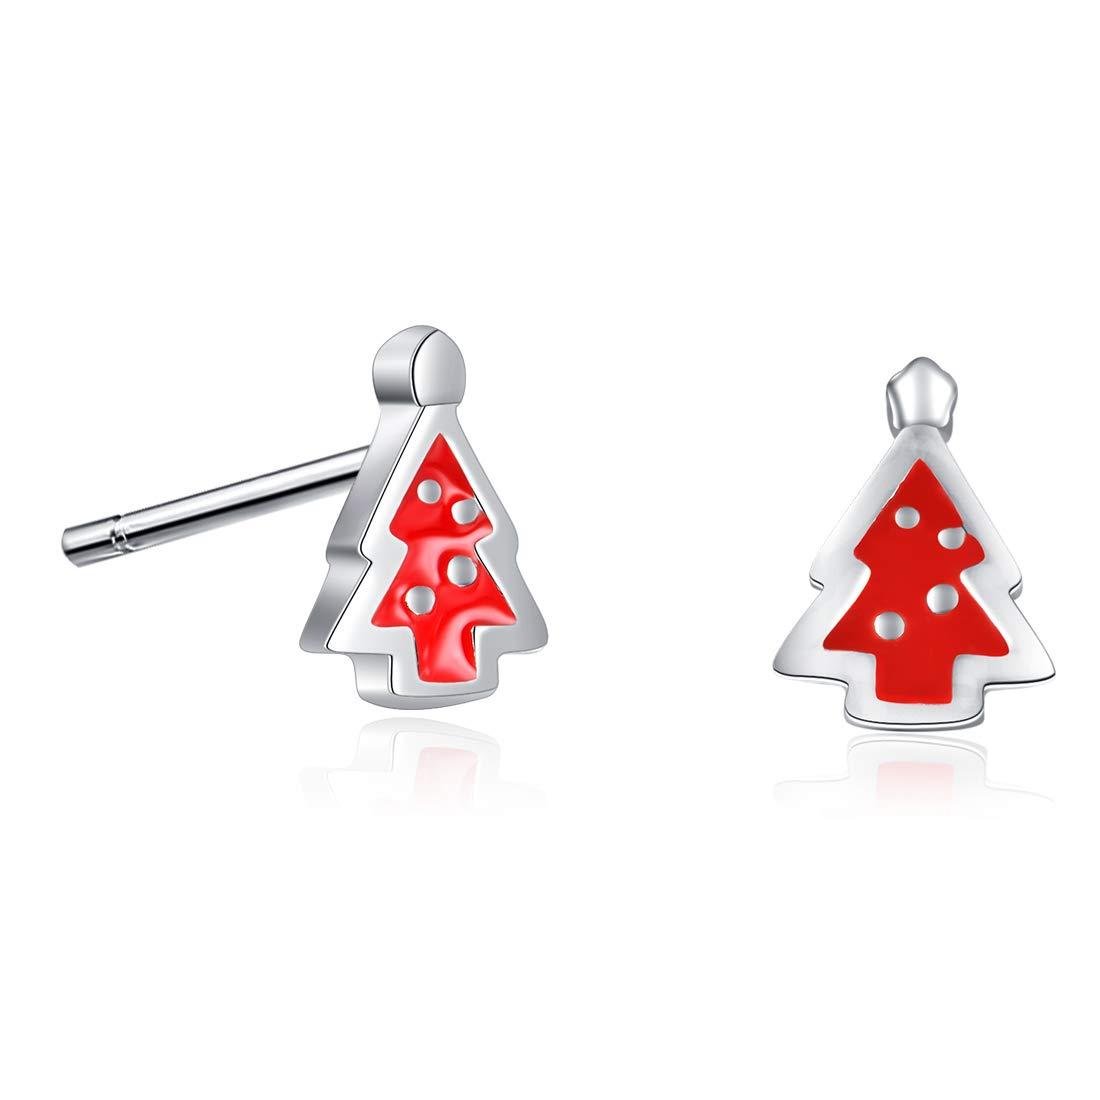 b63e817943e14 925 Sterling Silver Hypoallergenic Reindeer Antlers Christmas Tree Stud  Earrings for Kids Women Girls